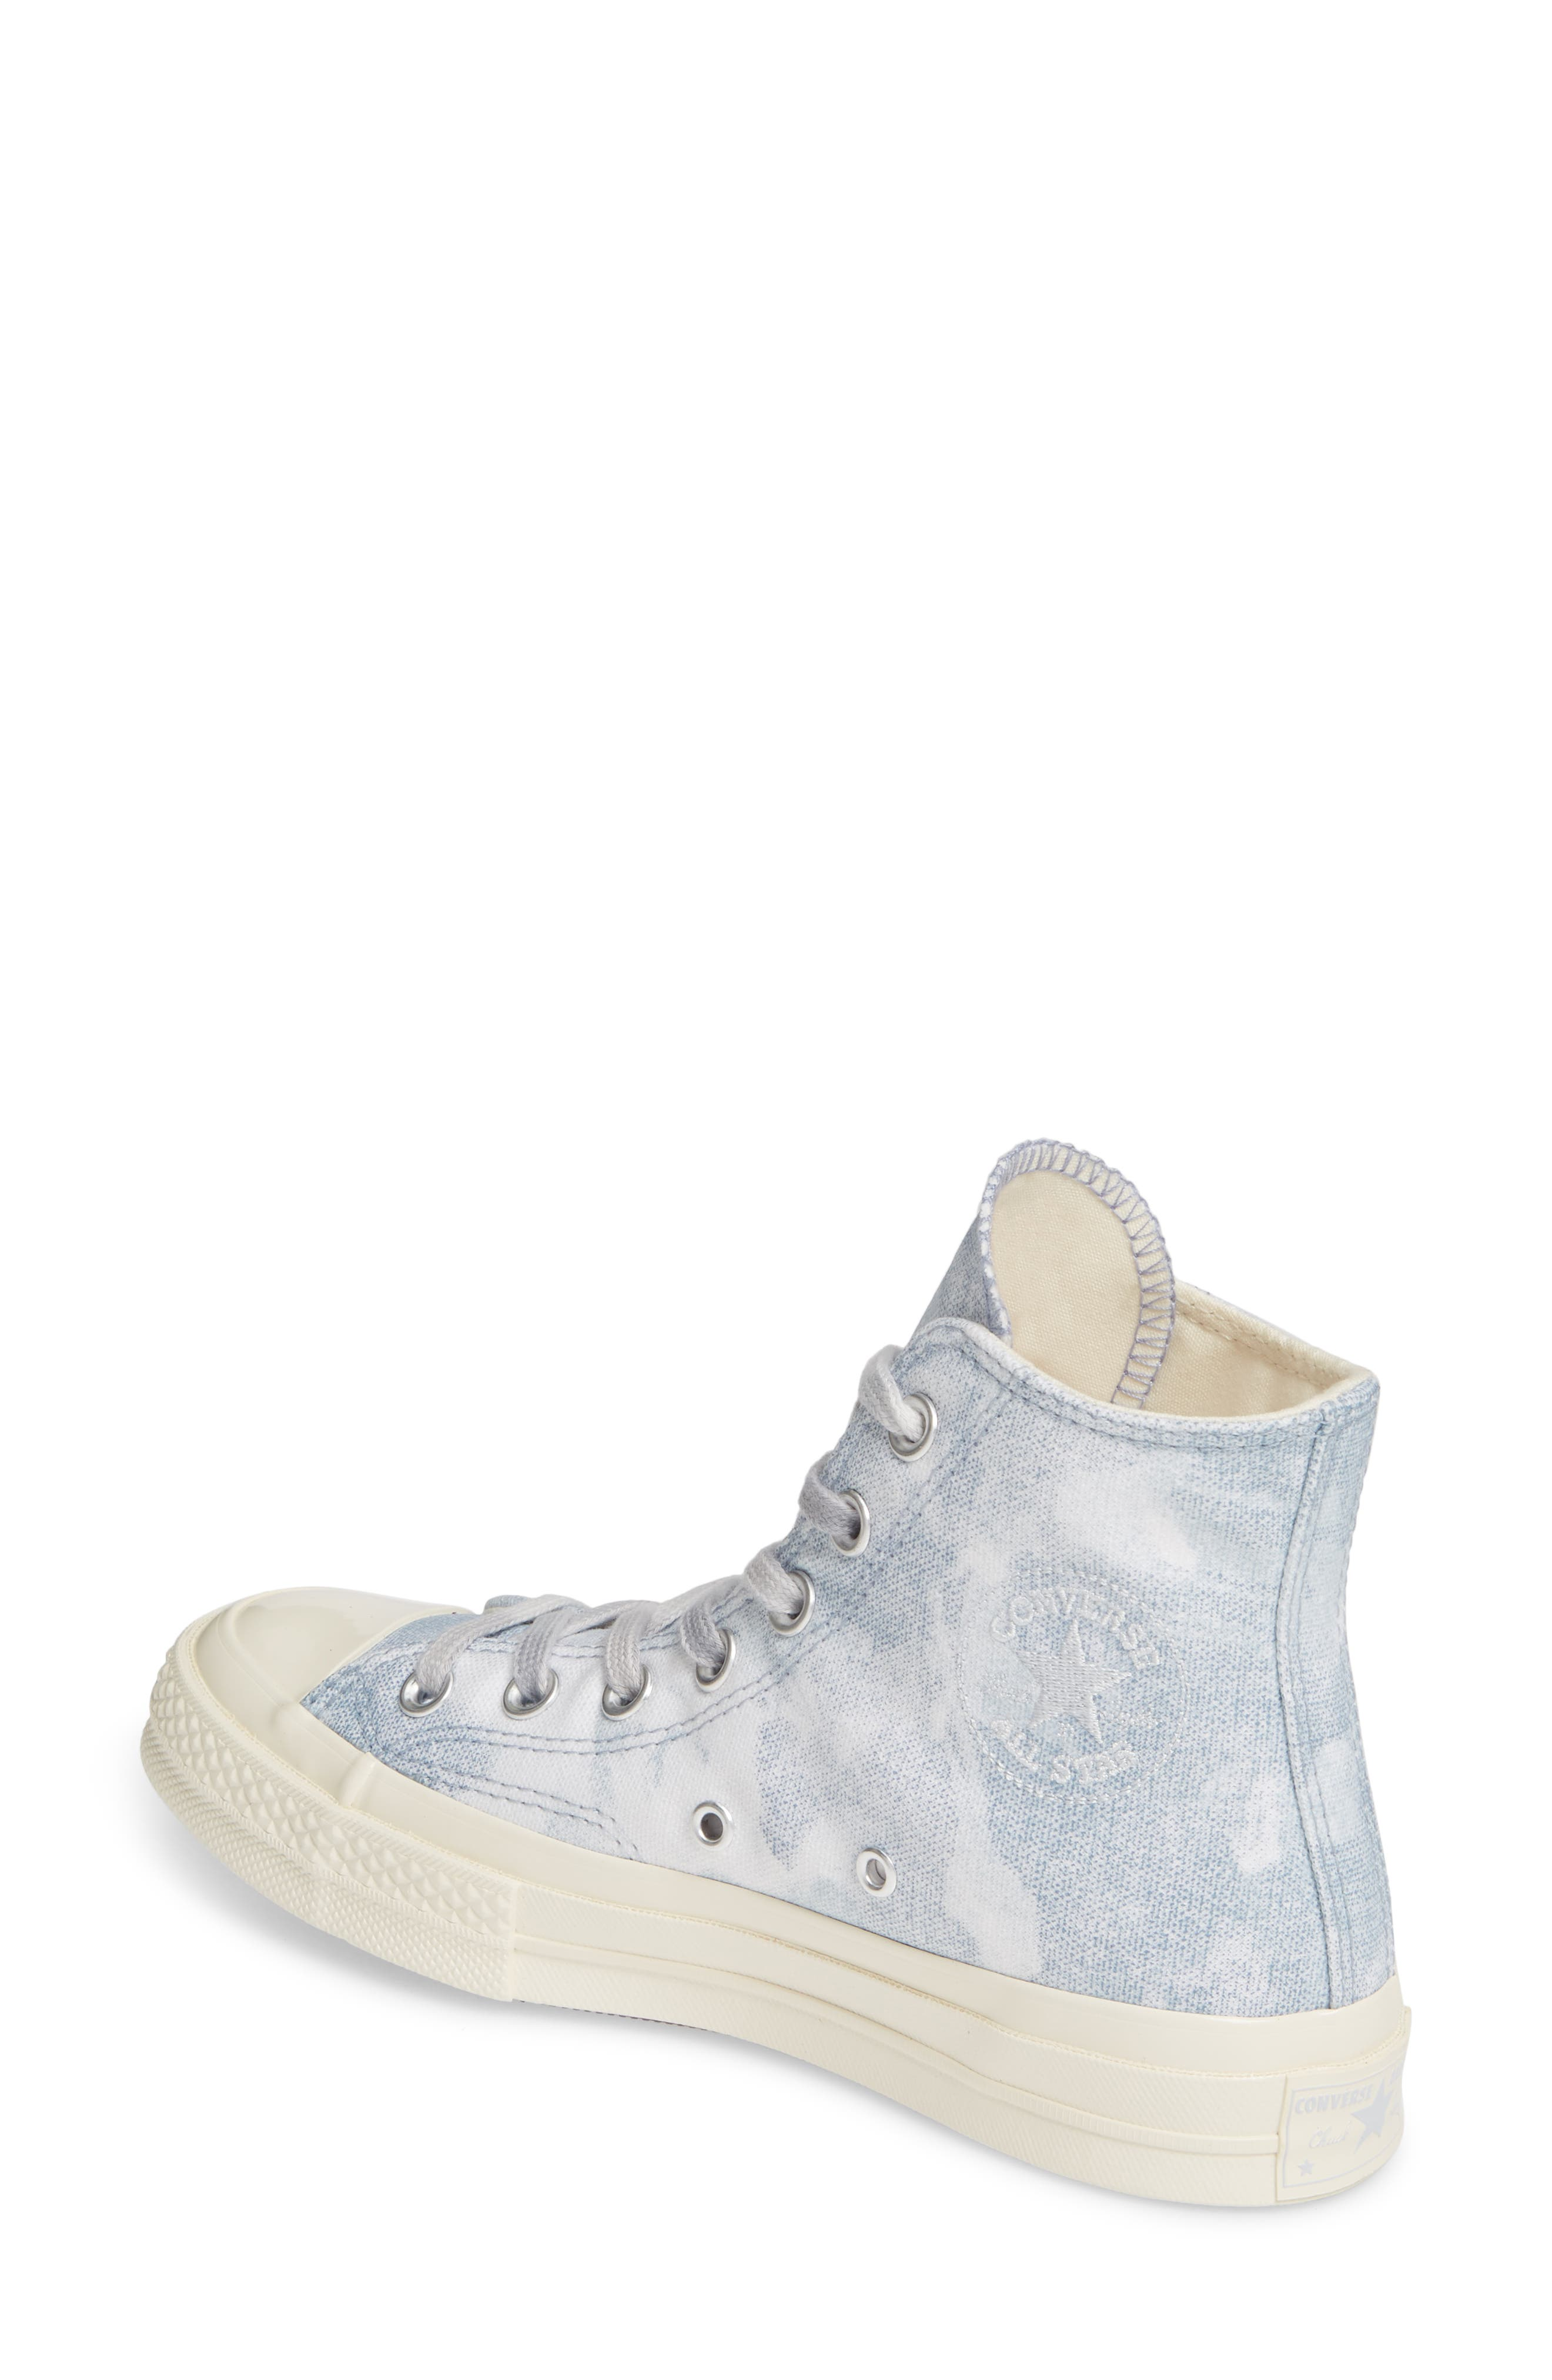 CONVERSE, Chuck Taylor<sup>®</sup> All Star<sup>®</sup> 70 High Top Sneaker, Alternate thumbnail 2, color, INDIGO FOG/ PLATINUM/ EGRET